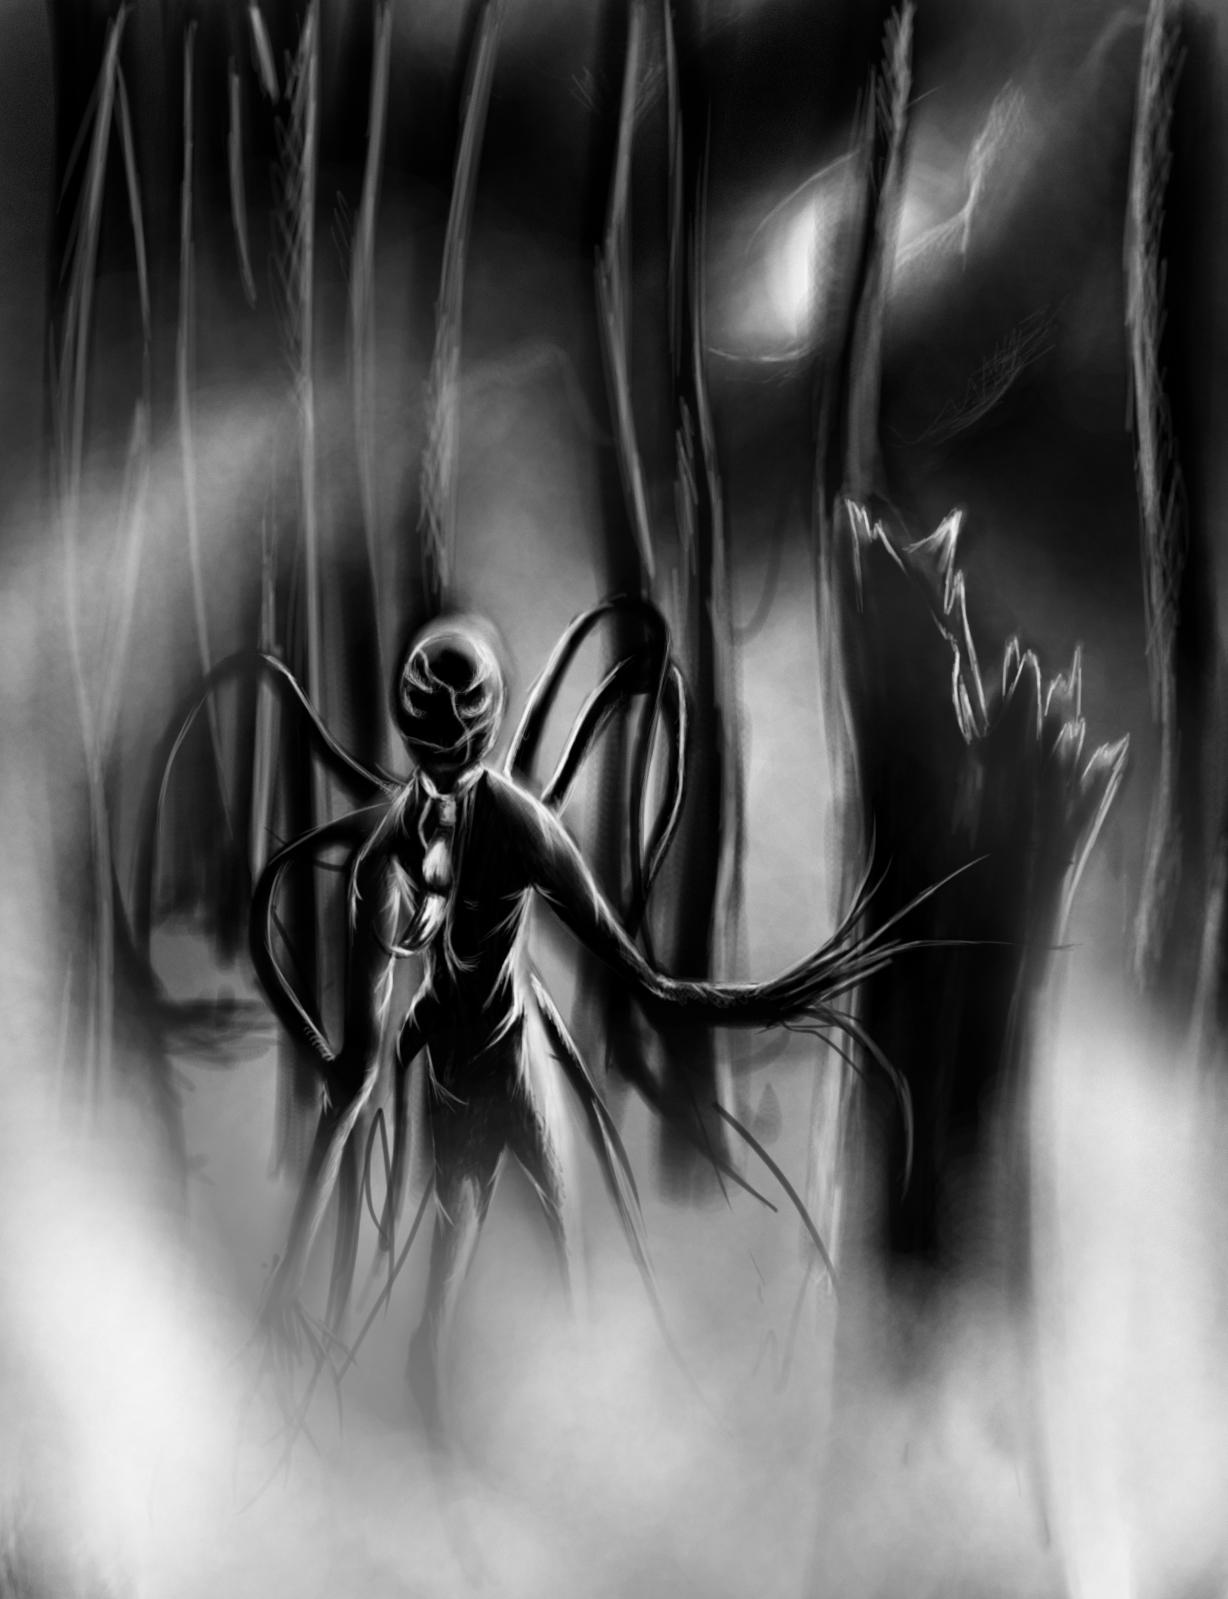 Drawn slenderman alien Man men Man com/ #Sighting